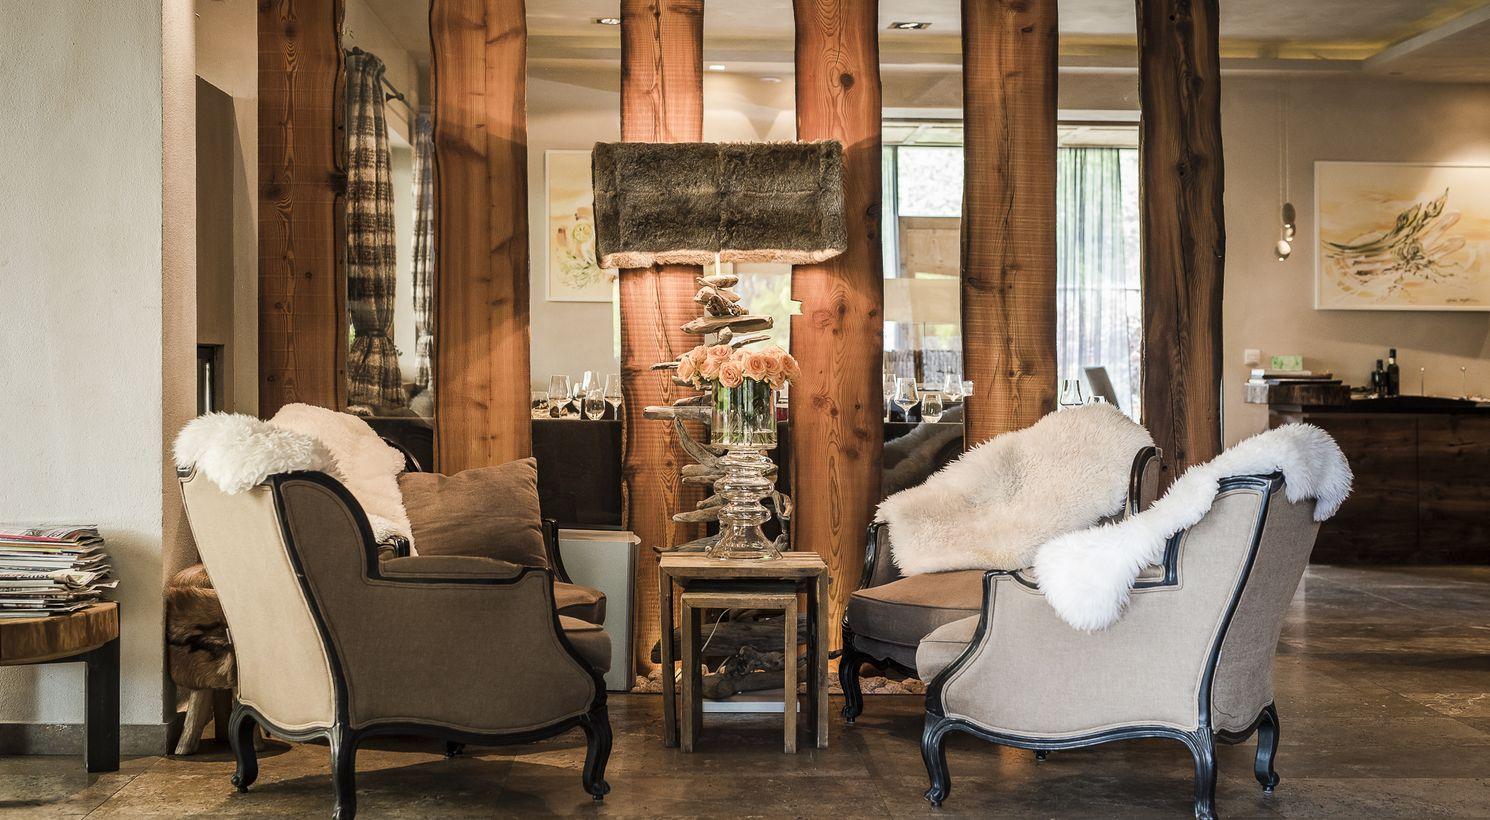 wohlf hlambiente im hotel restaurant kirchsteiger v llan. Black Bedroom Furniture Sets. Home Design Ideas